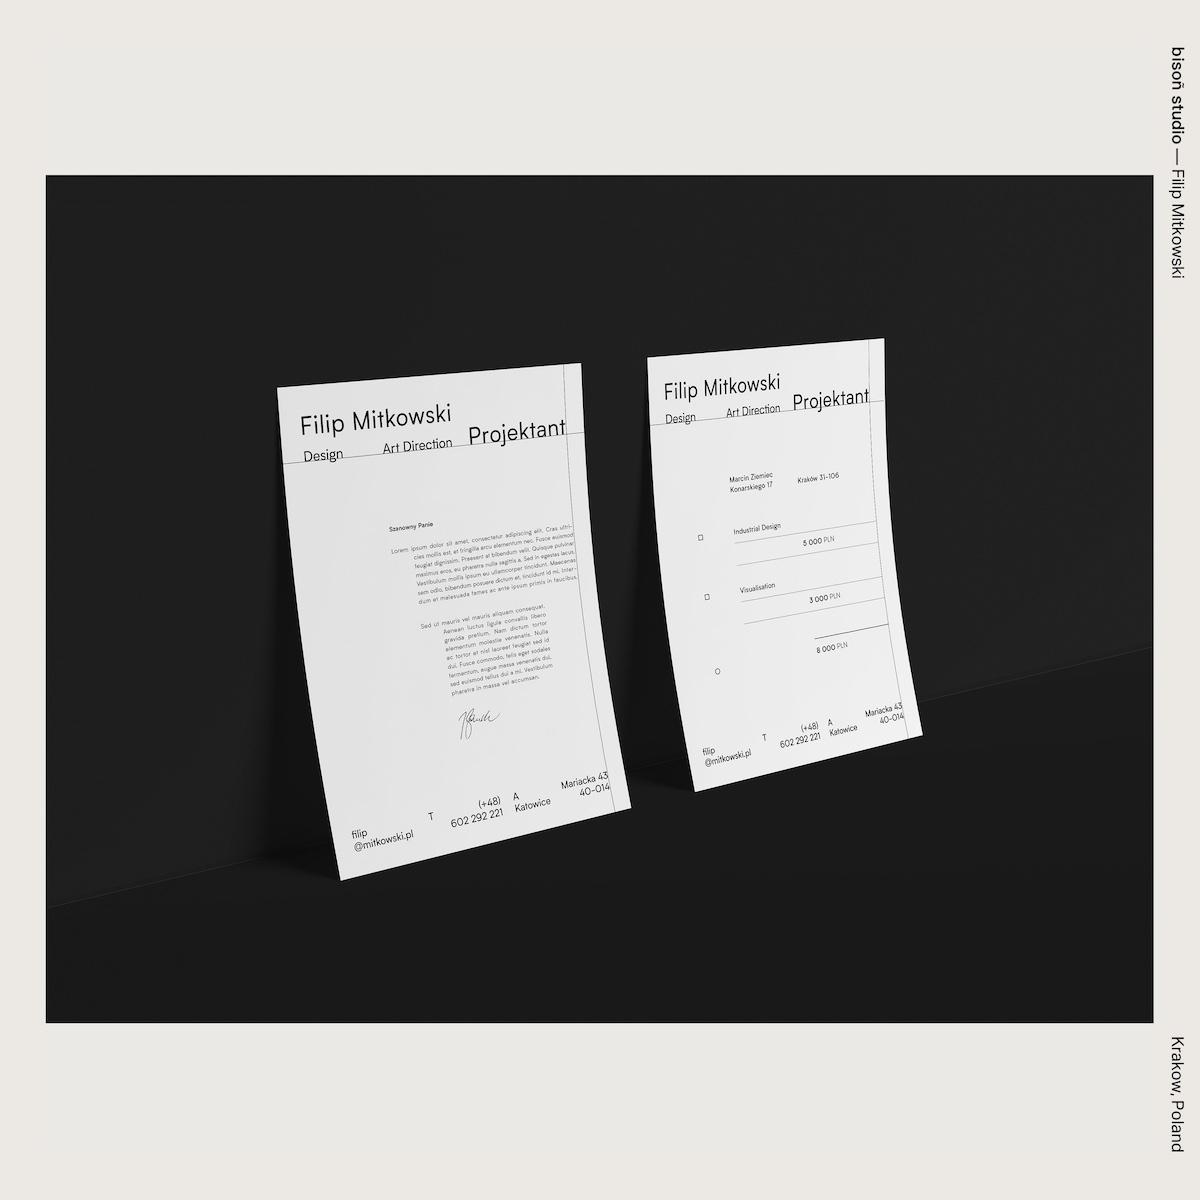 bisoñ studio — Filip Mitkowski